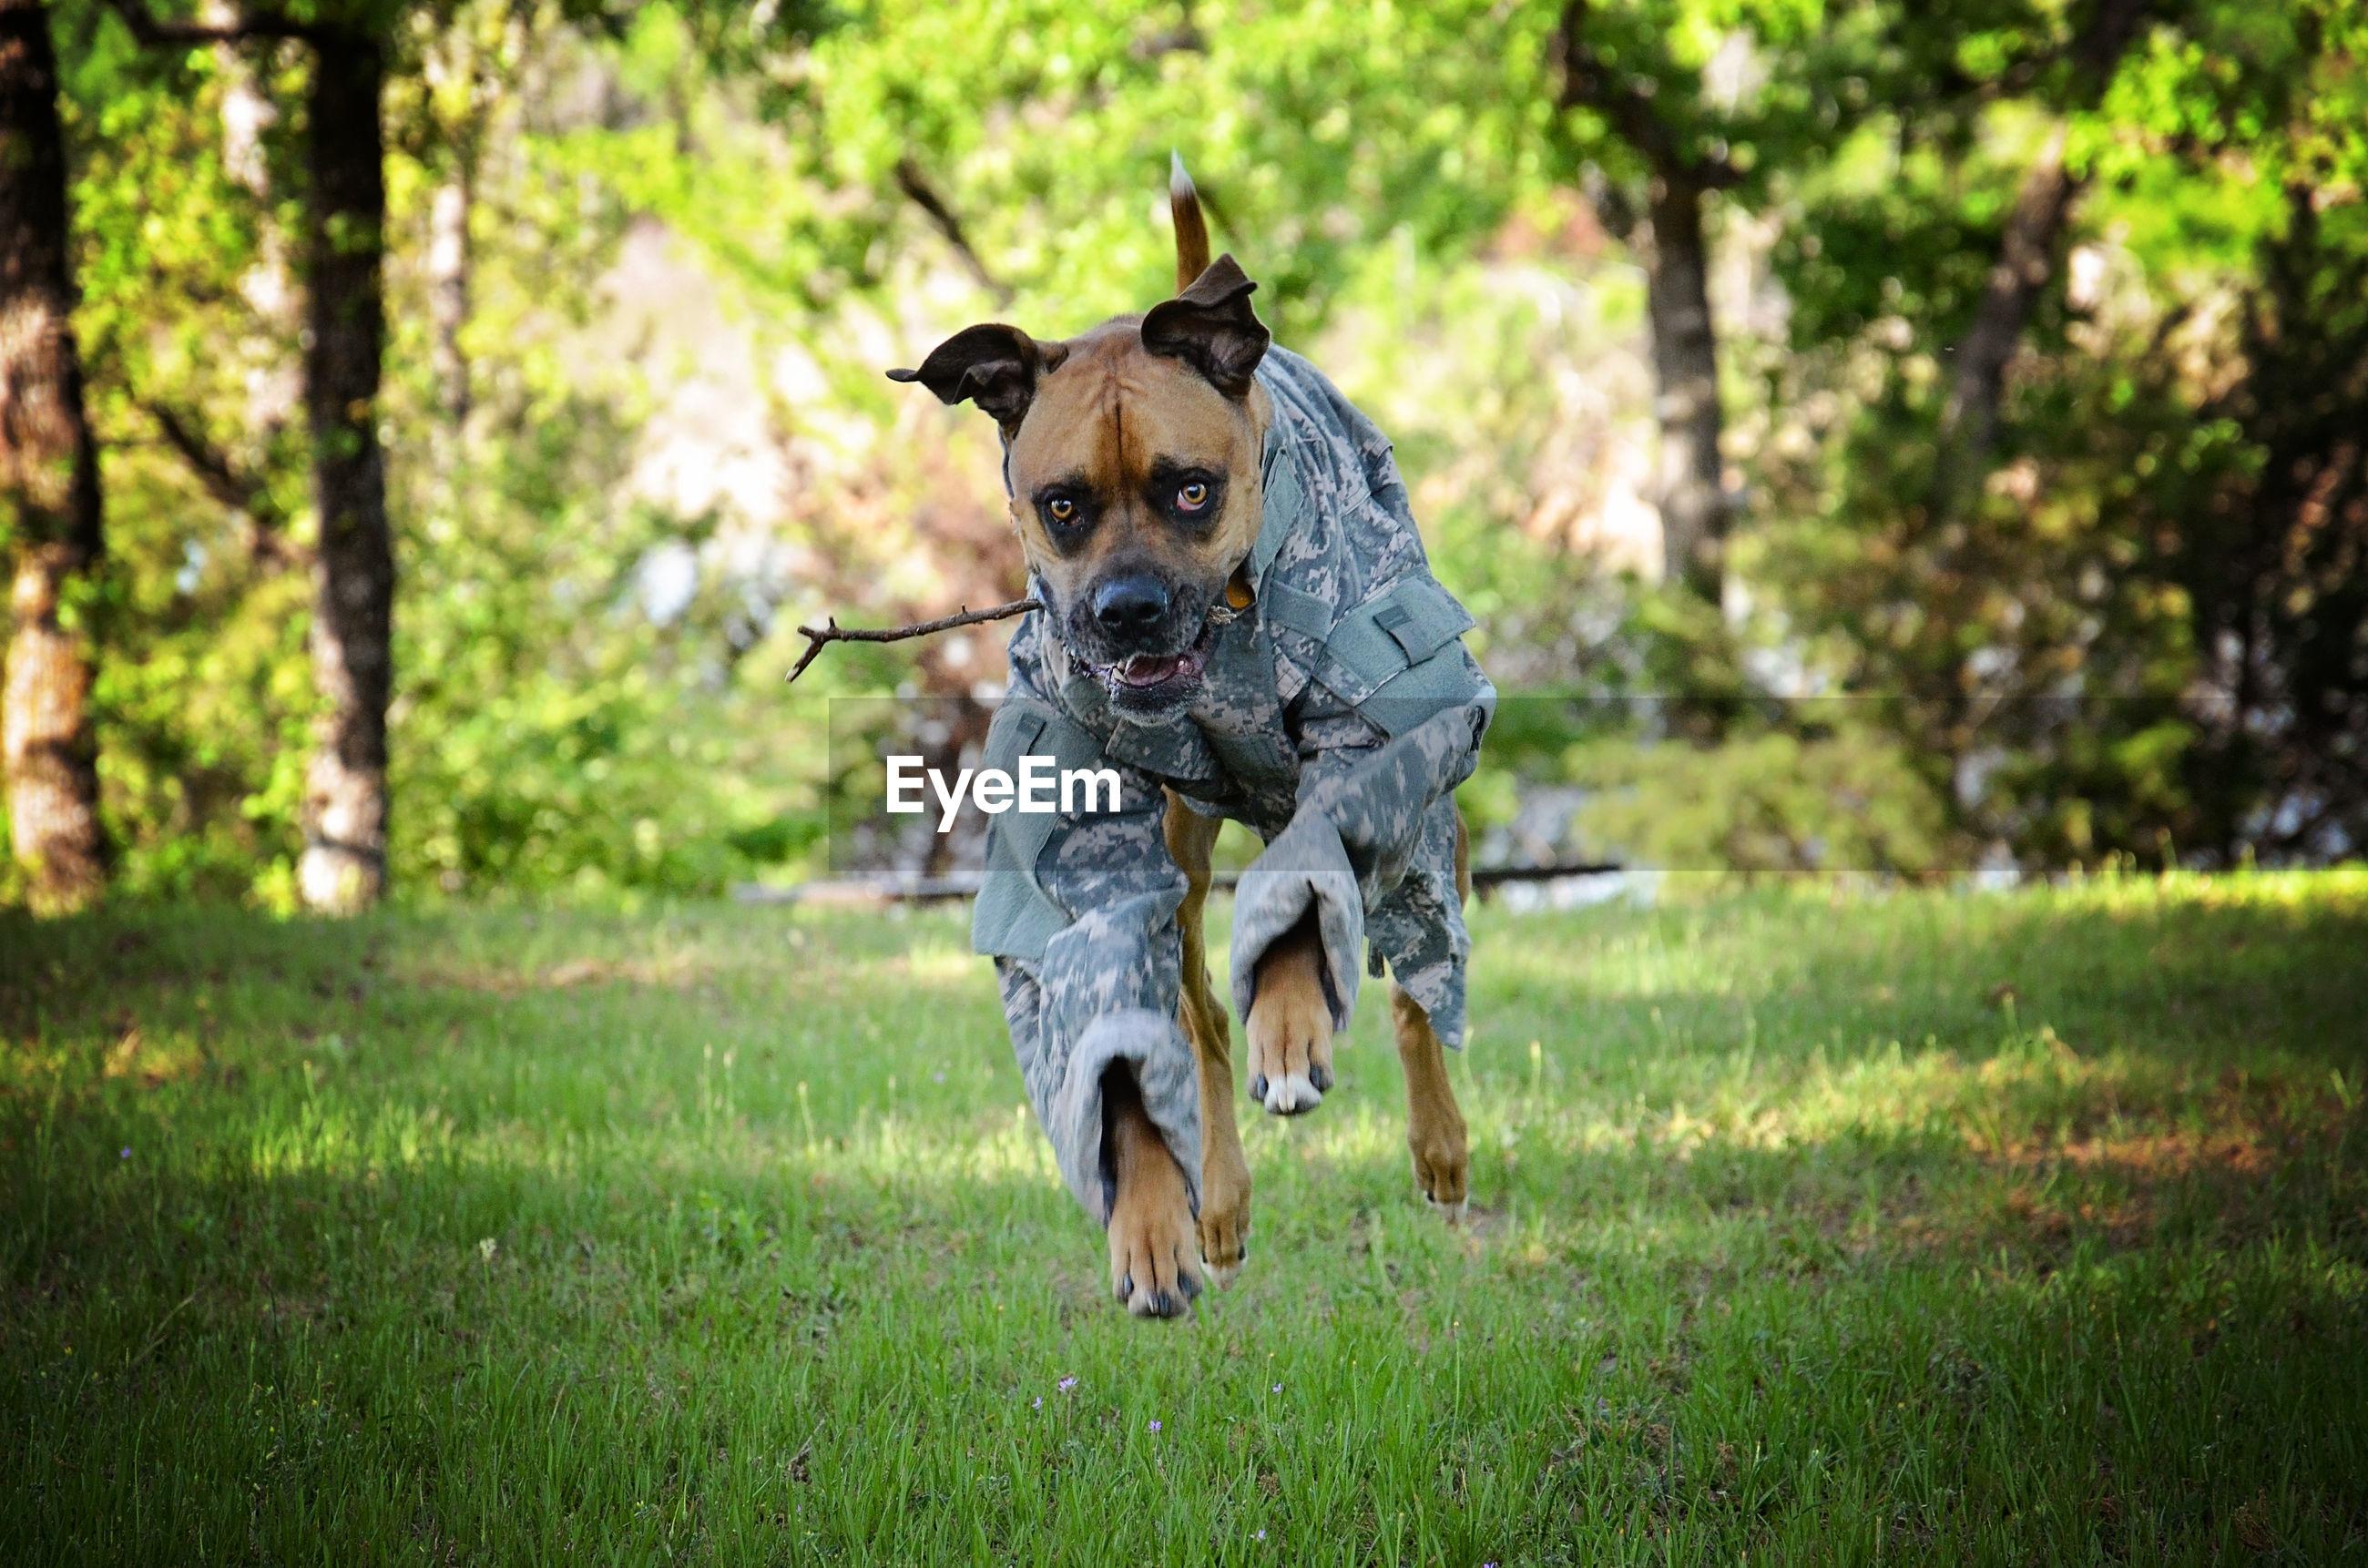 Dog in military uniform running on grass